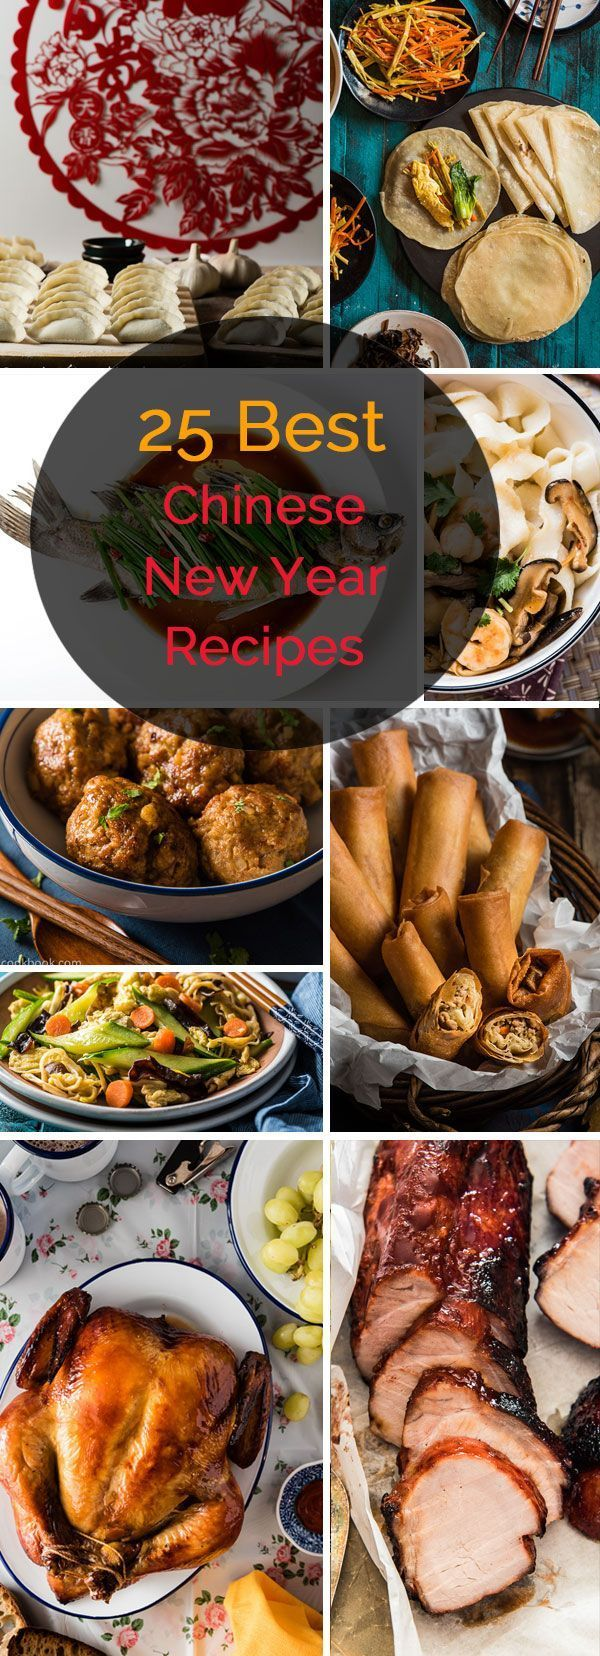 Top 25 Chinese New Year Recipes | http://omnivorescookbook.com